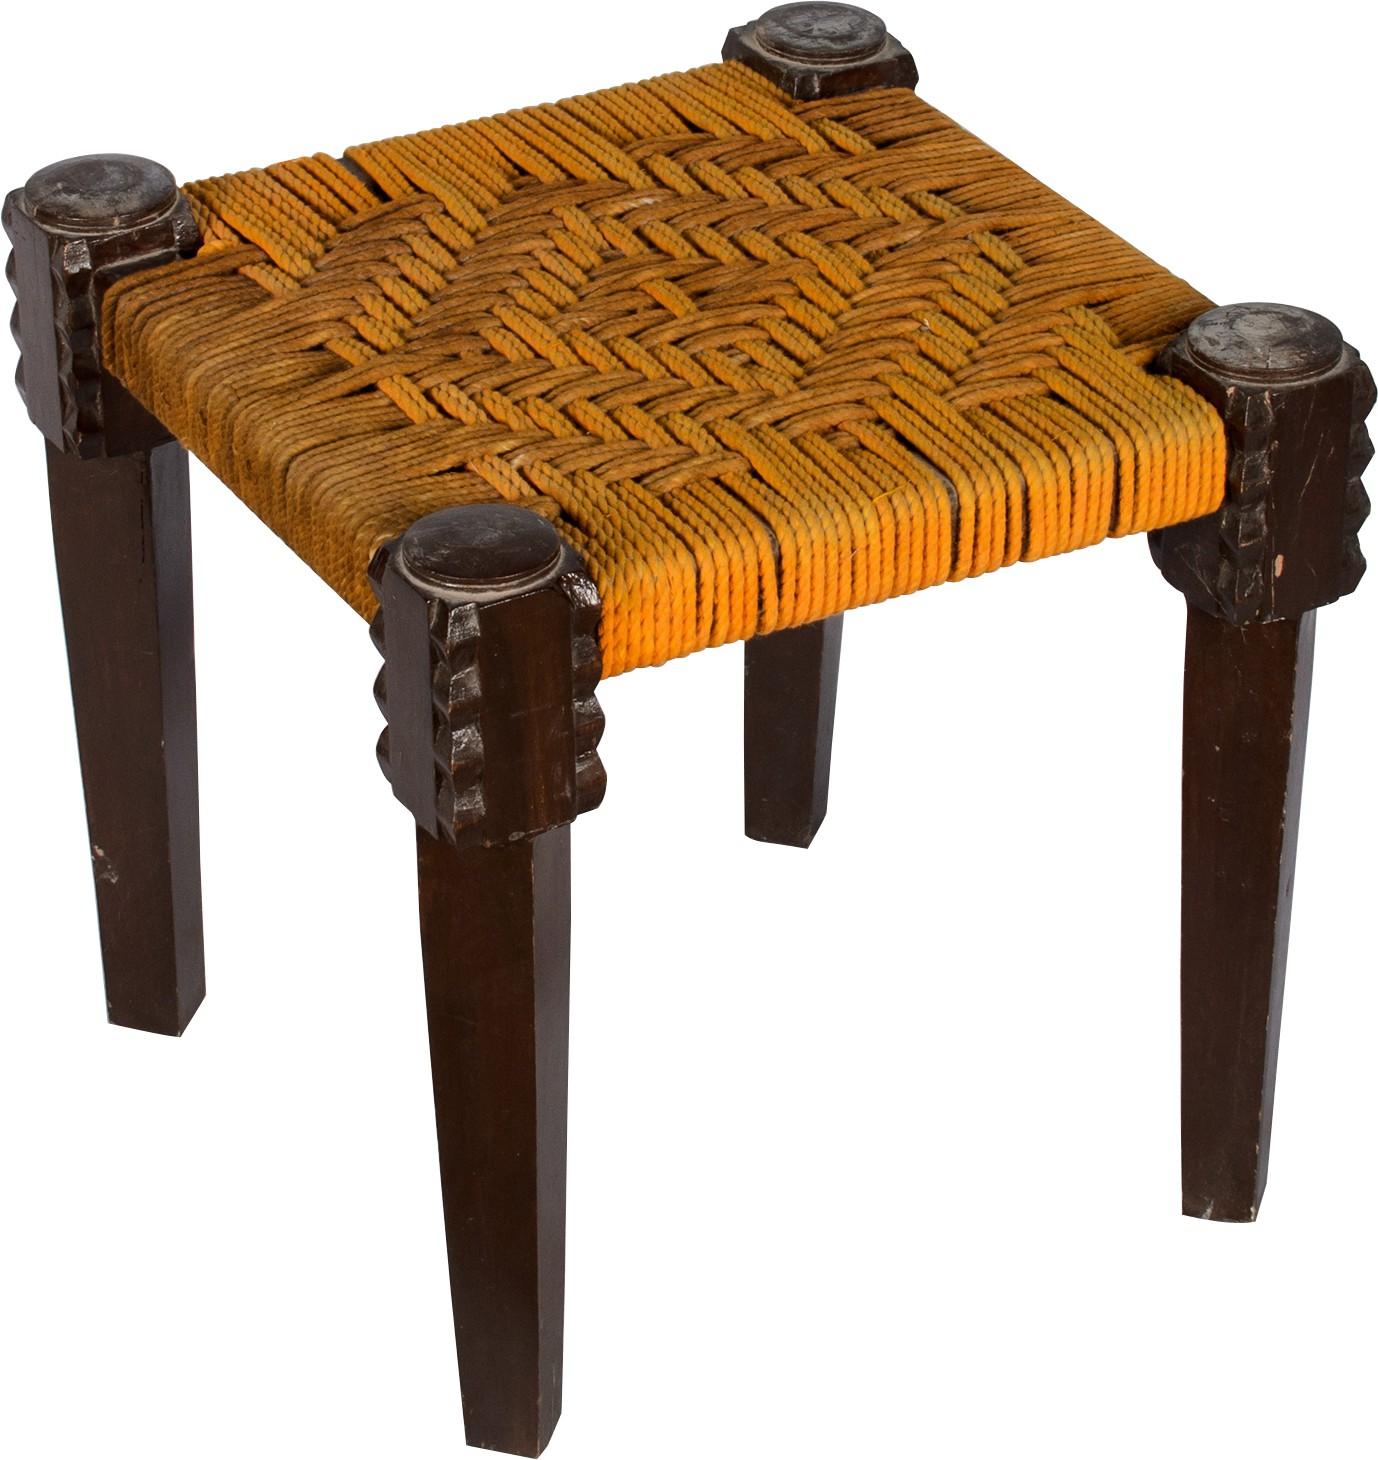 View Hastkala Solid Wood Stool(Finish Color - Black) Furniture (Hastkala)